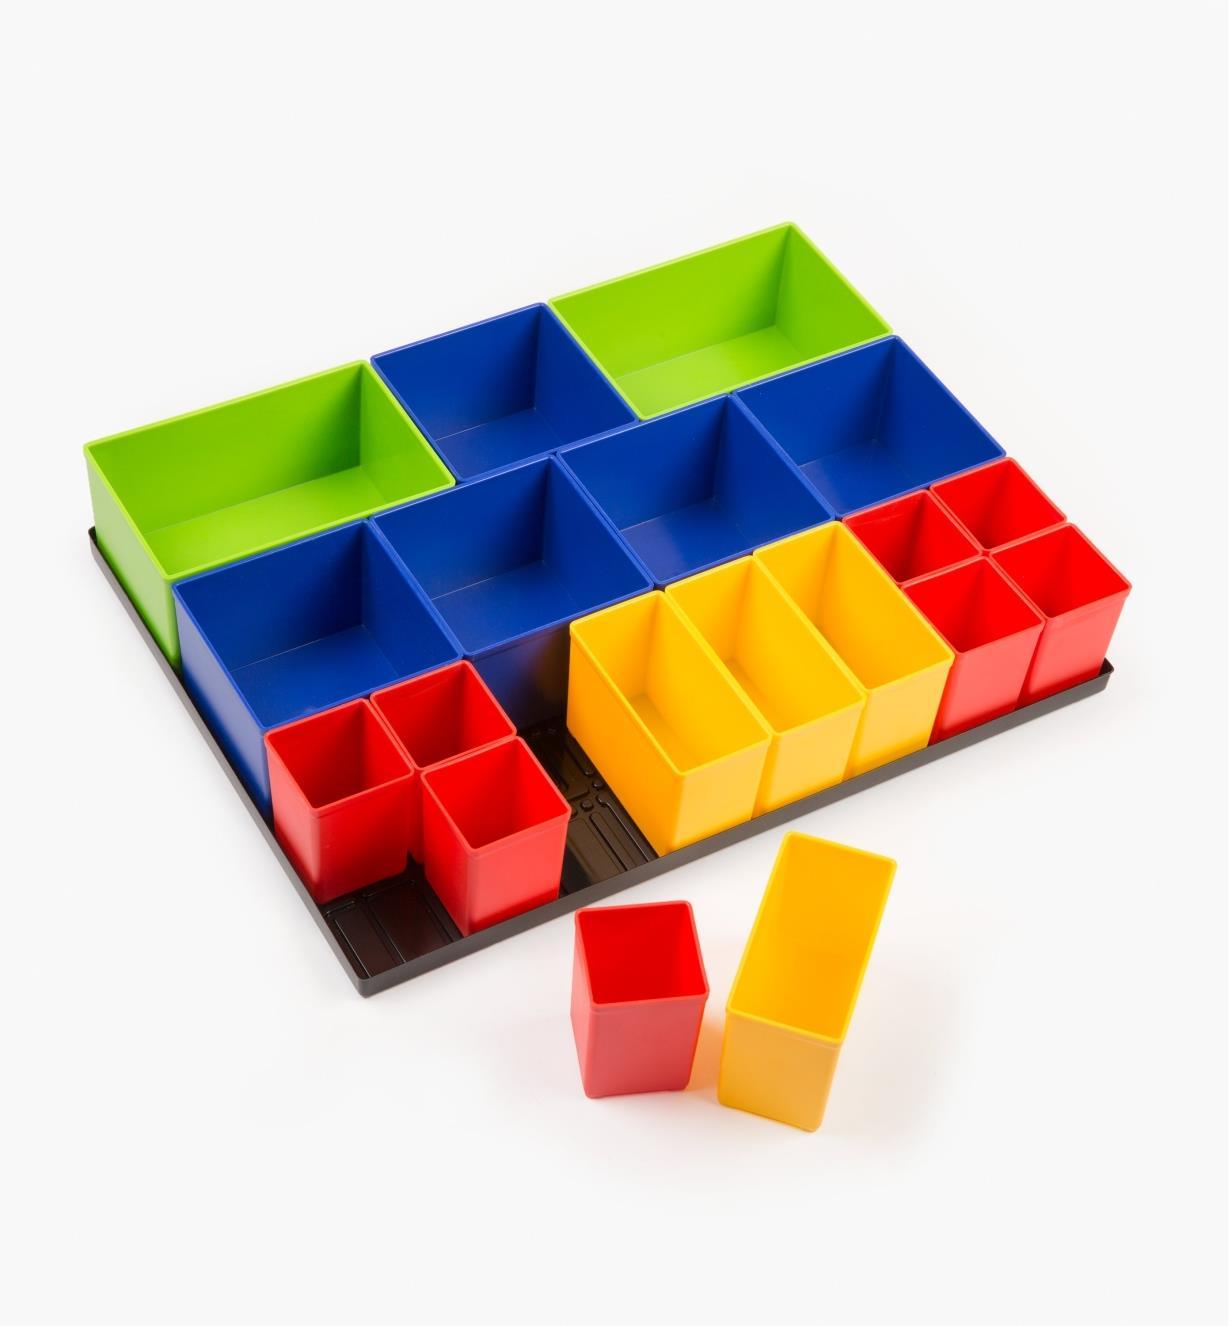 68K4653 - Tray & 19 Modular Boxes